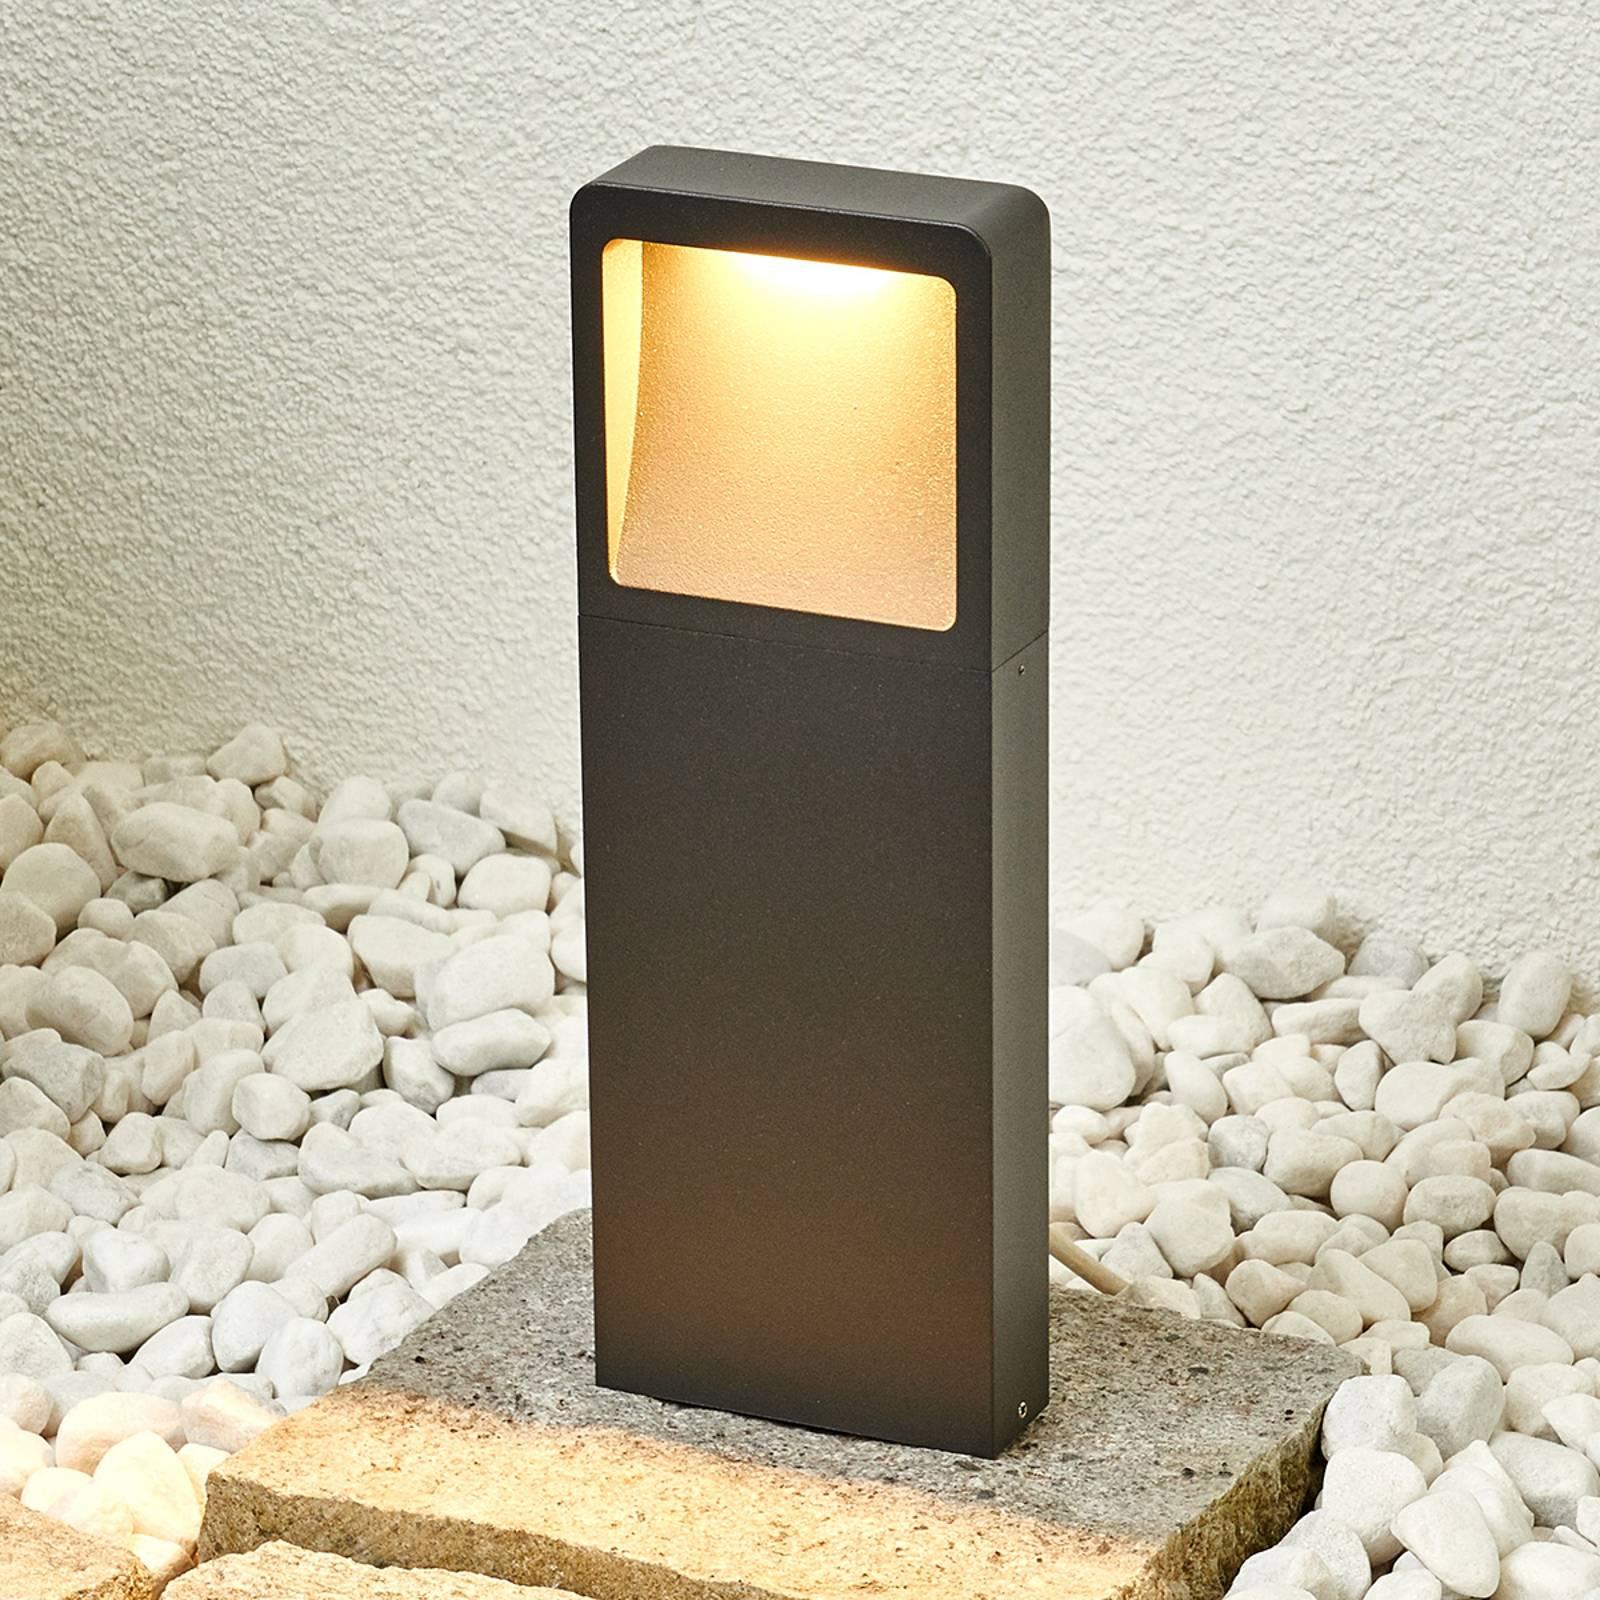 Moderne LED-Sockelleuchte Leya günstig online kaufen